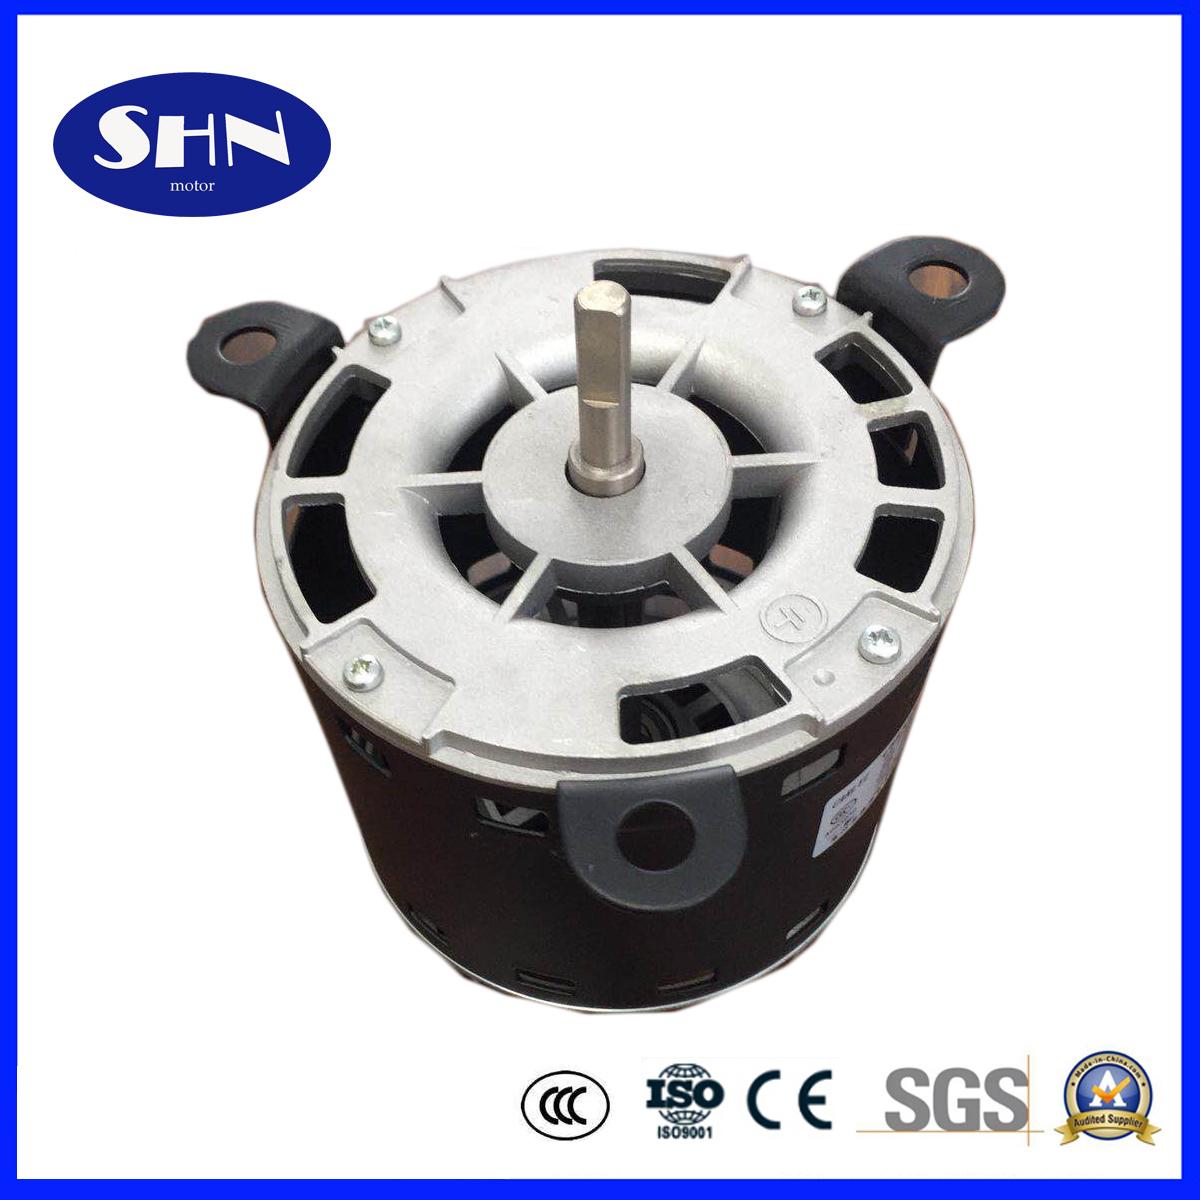 Universal Motor Single Phase Permanent Split Capacitor Motor Indoor Air Conditioner Fan Motor